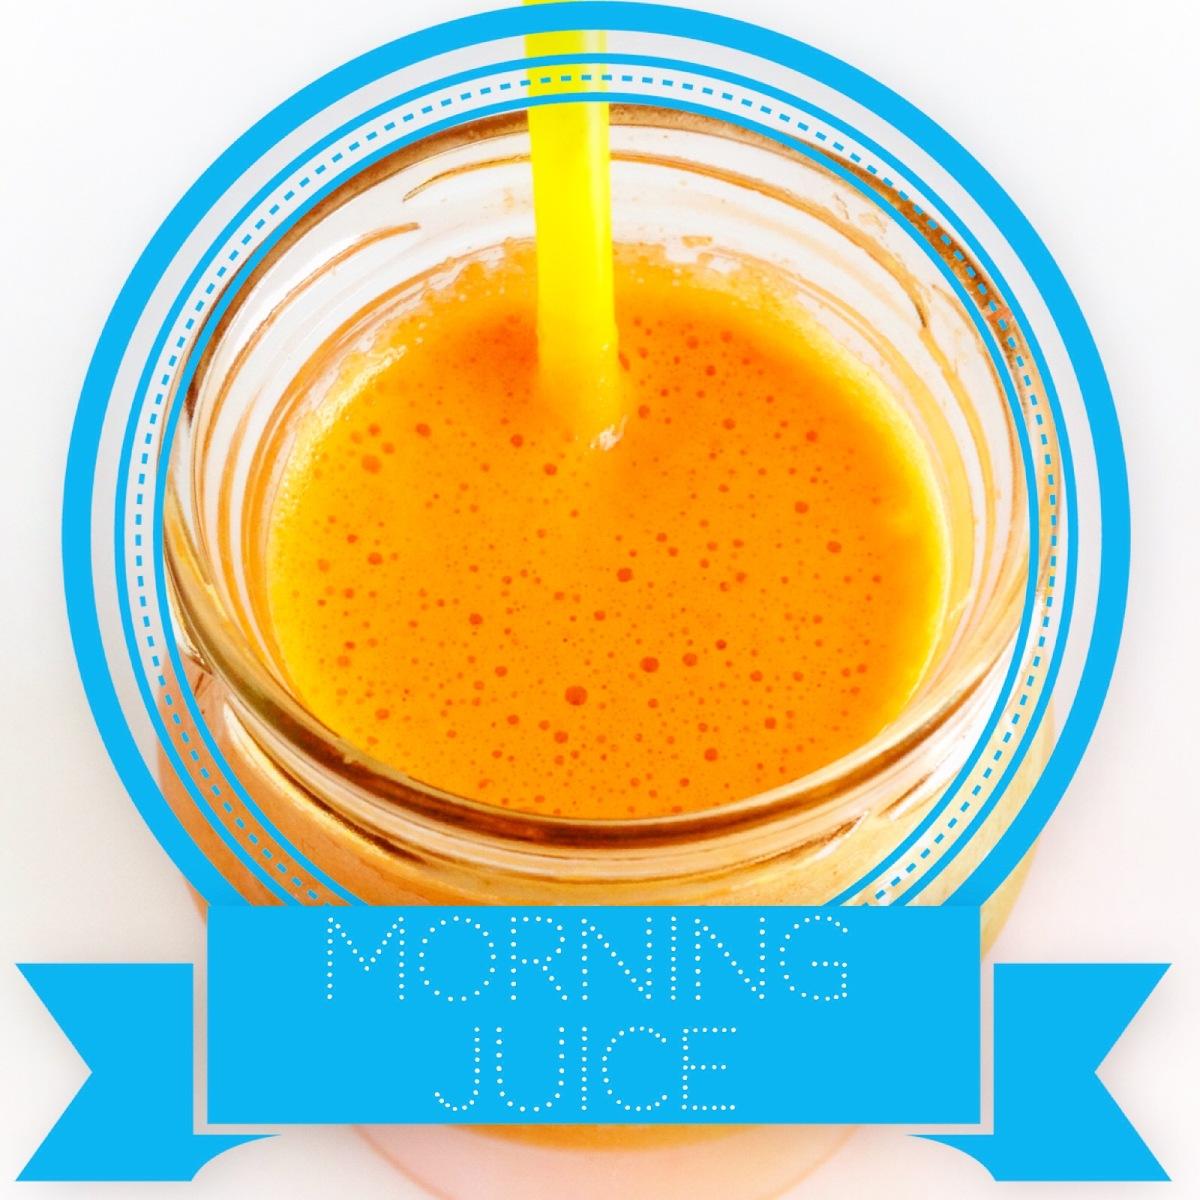 Morning Juice | ecogreenlove